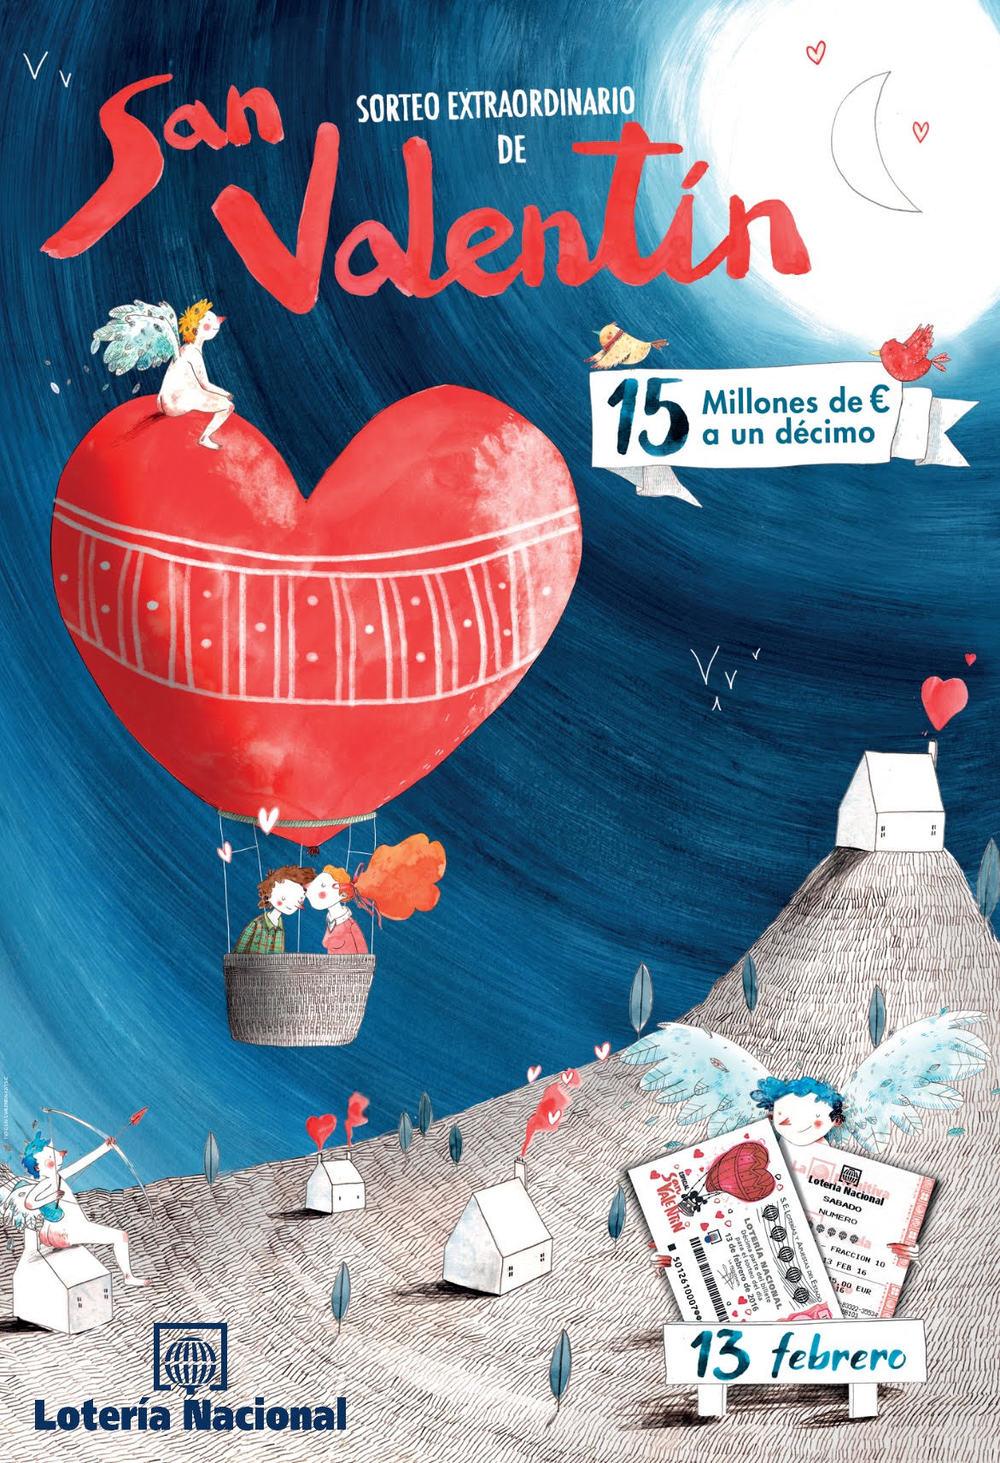 San Valentín Albert Arrayás11.jpg